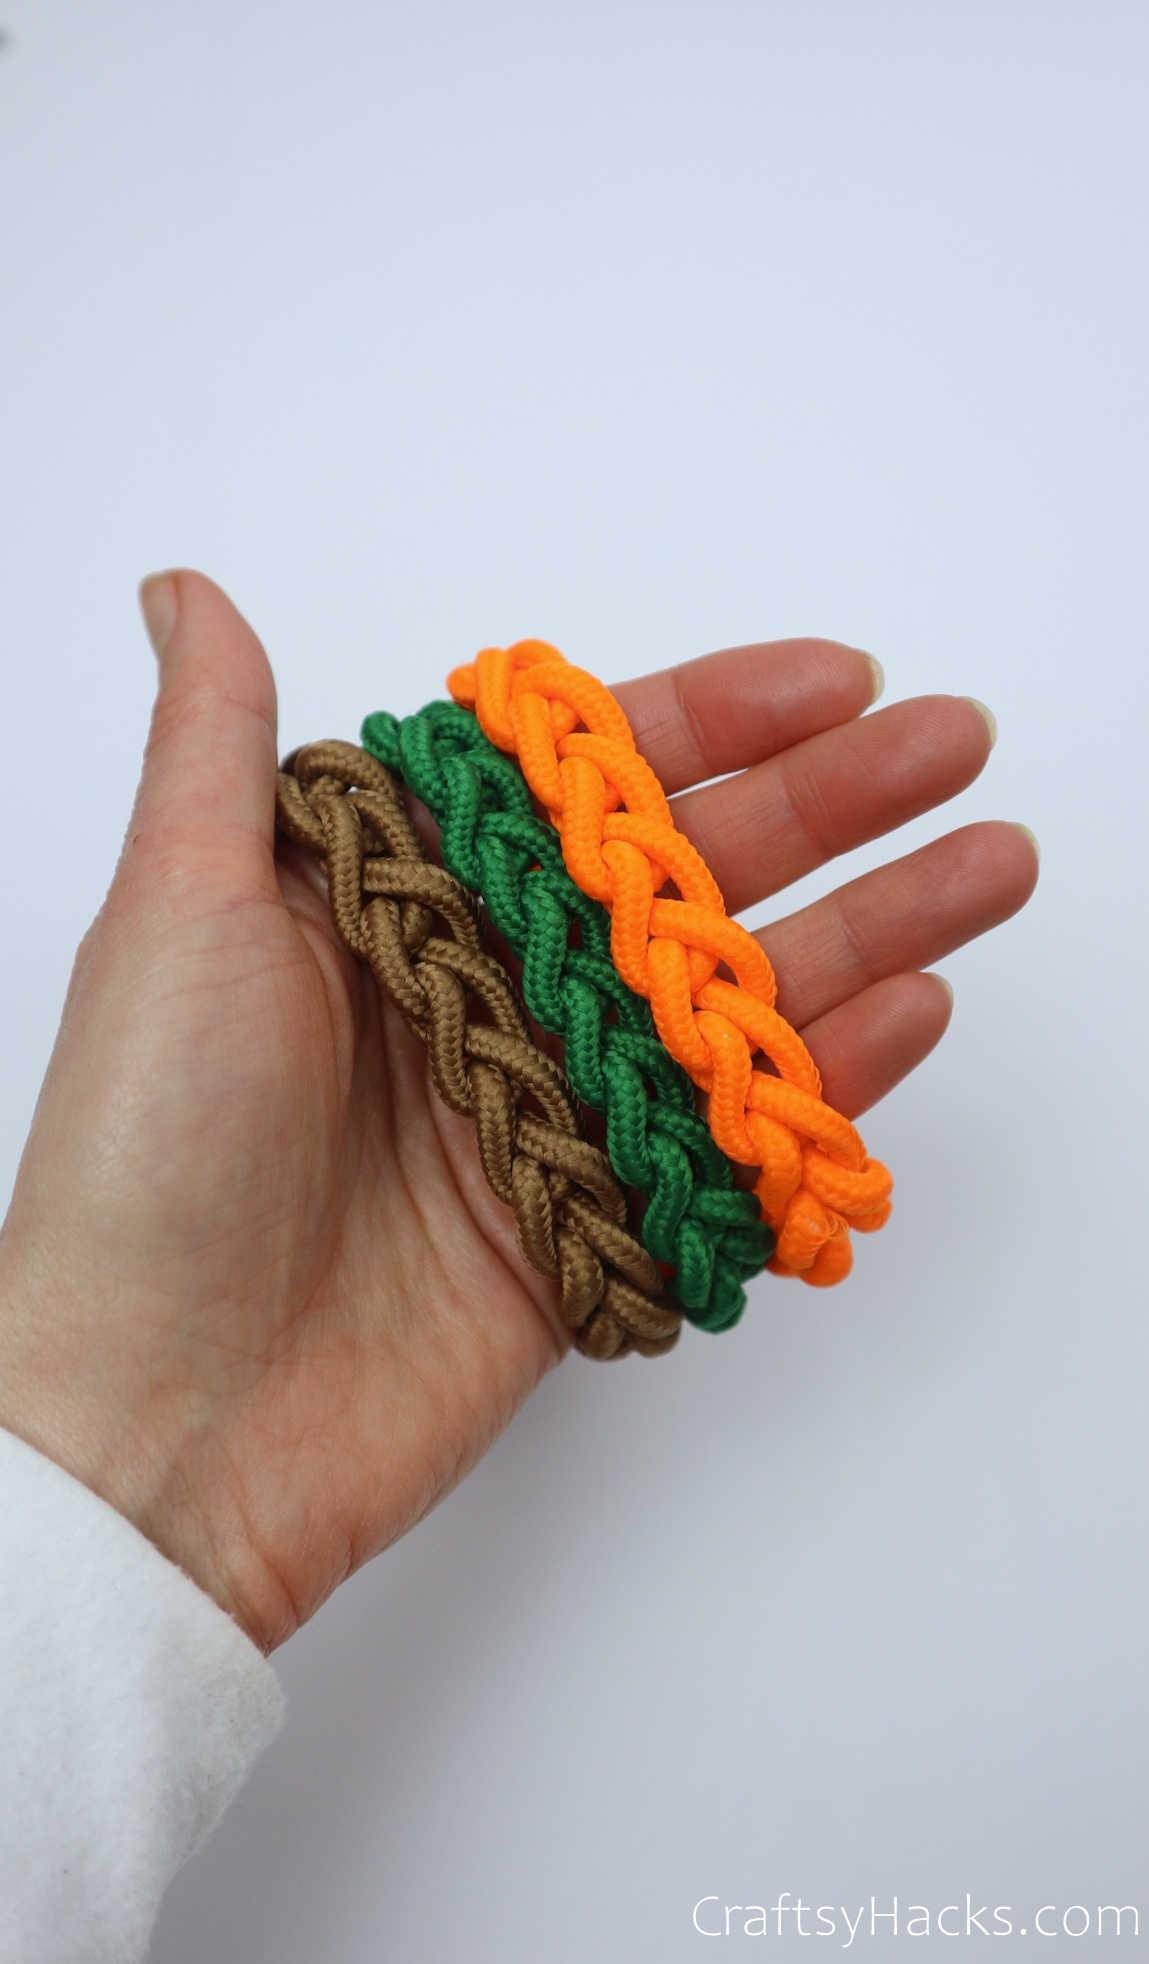 holding brown, green, and orange bracelets